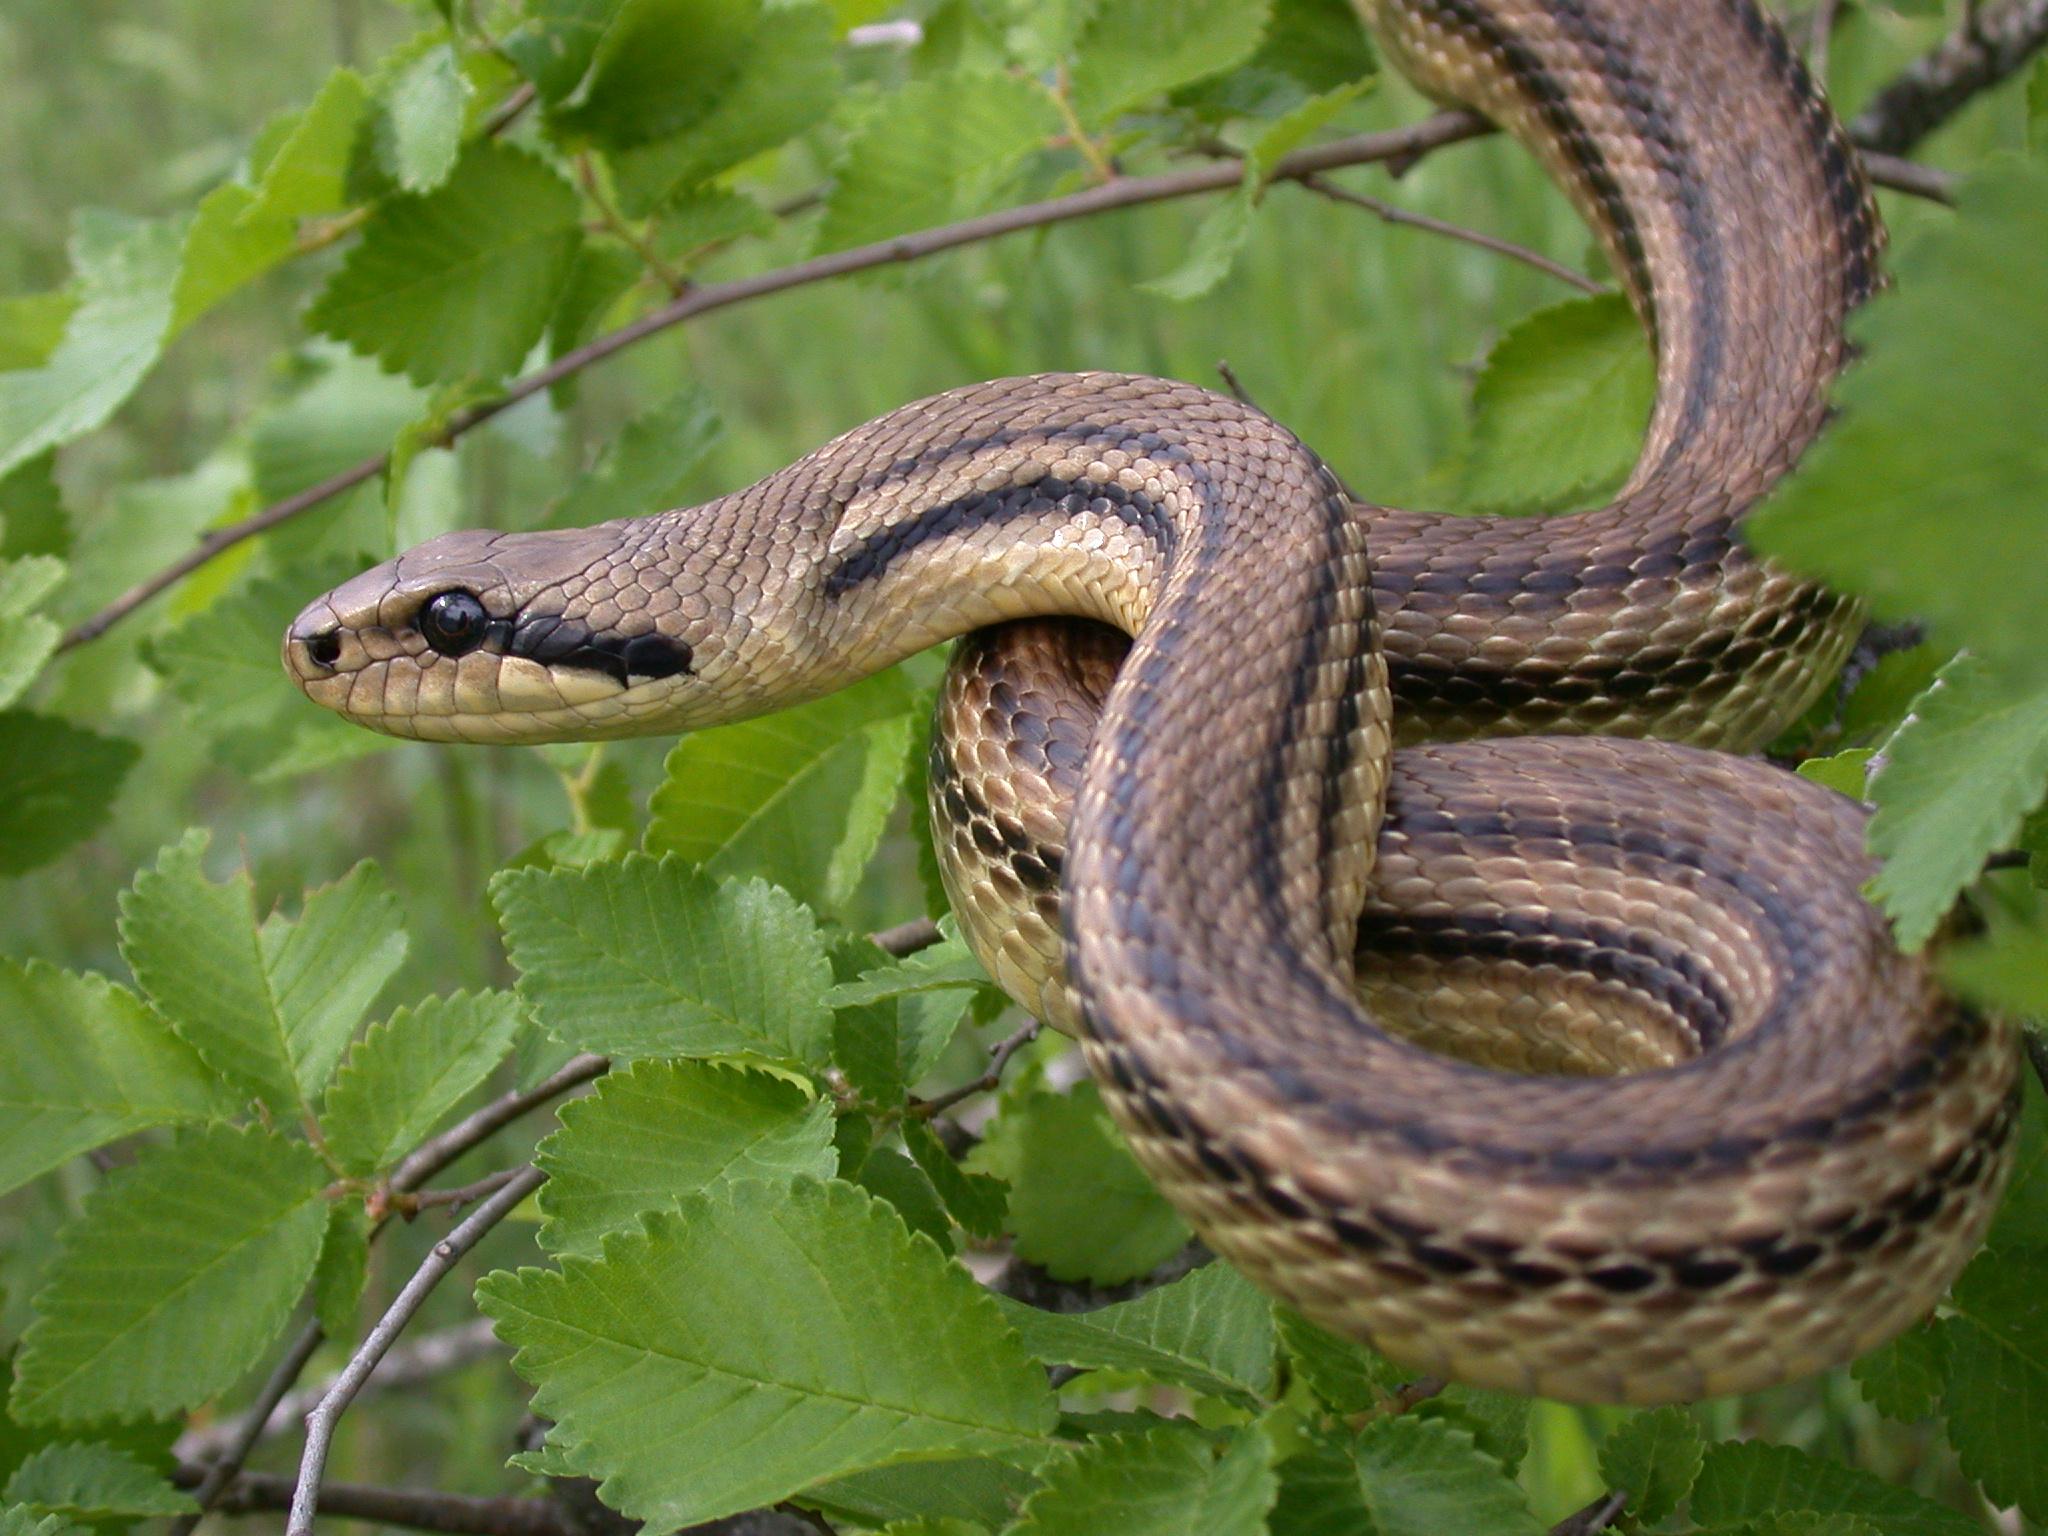 фото картинка змей полоз места для